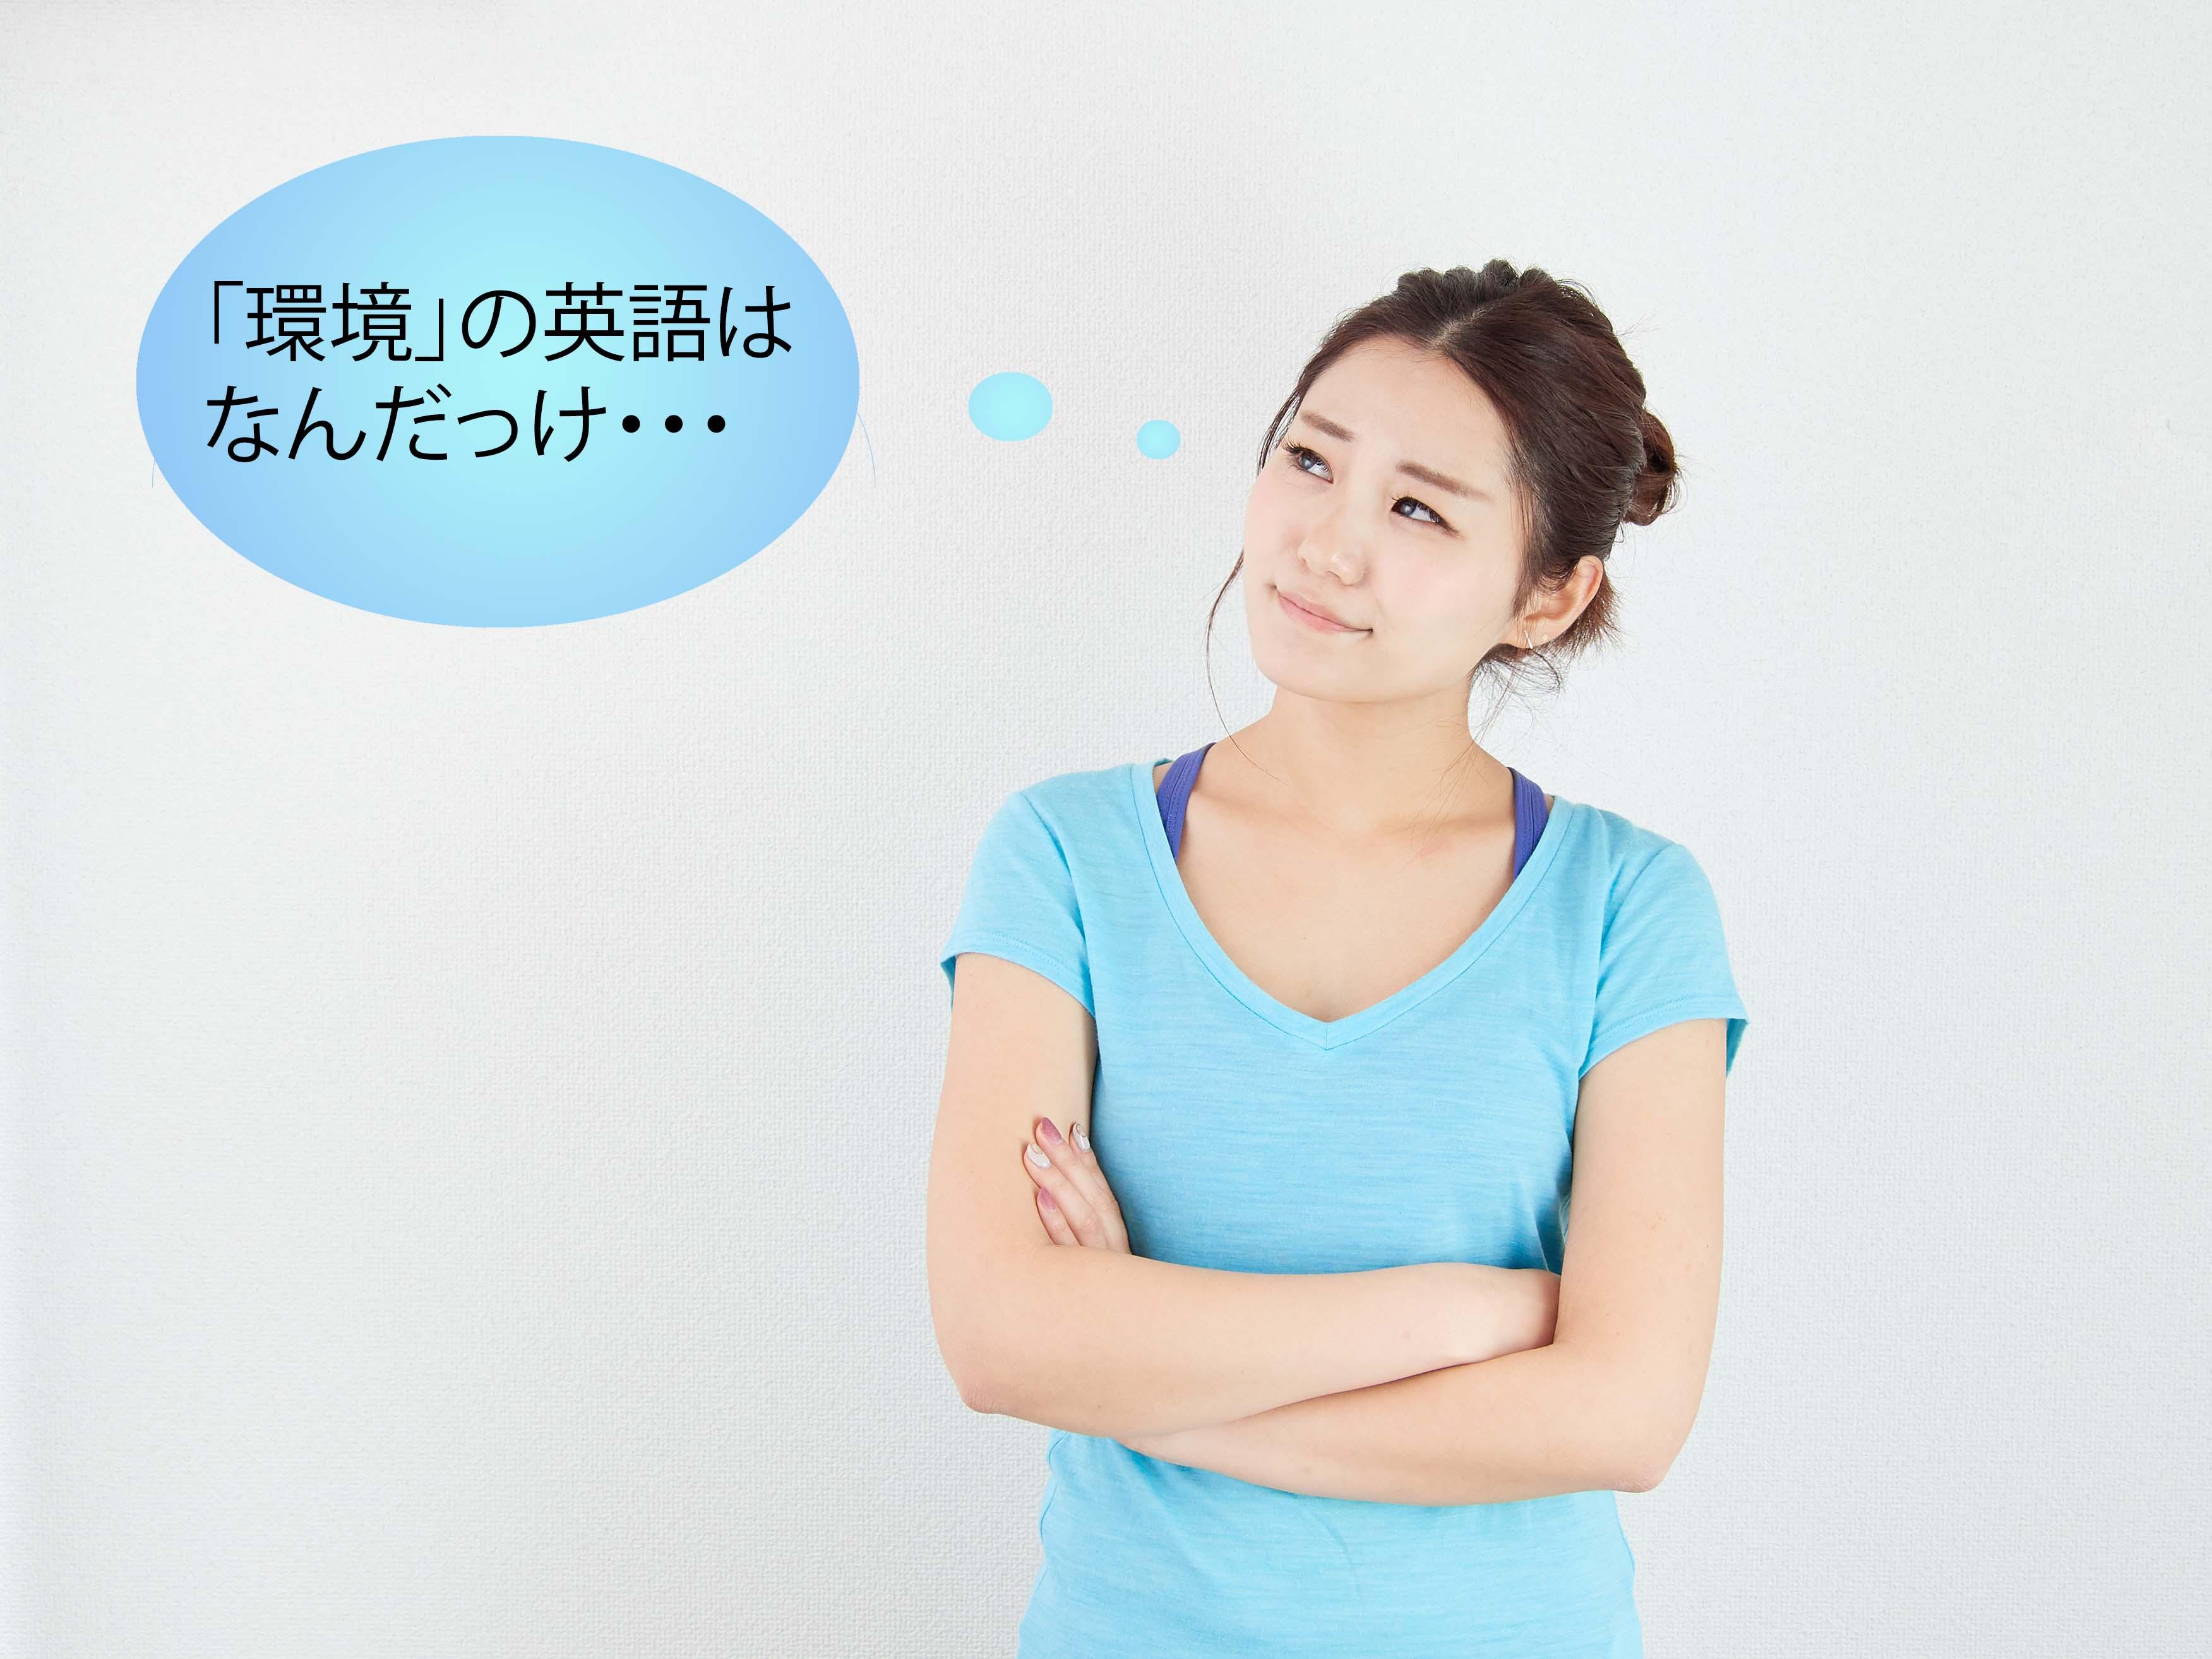 Speakingのための勉強法